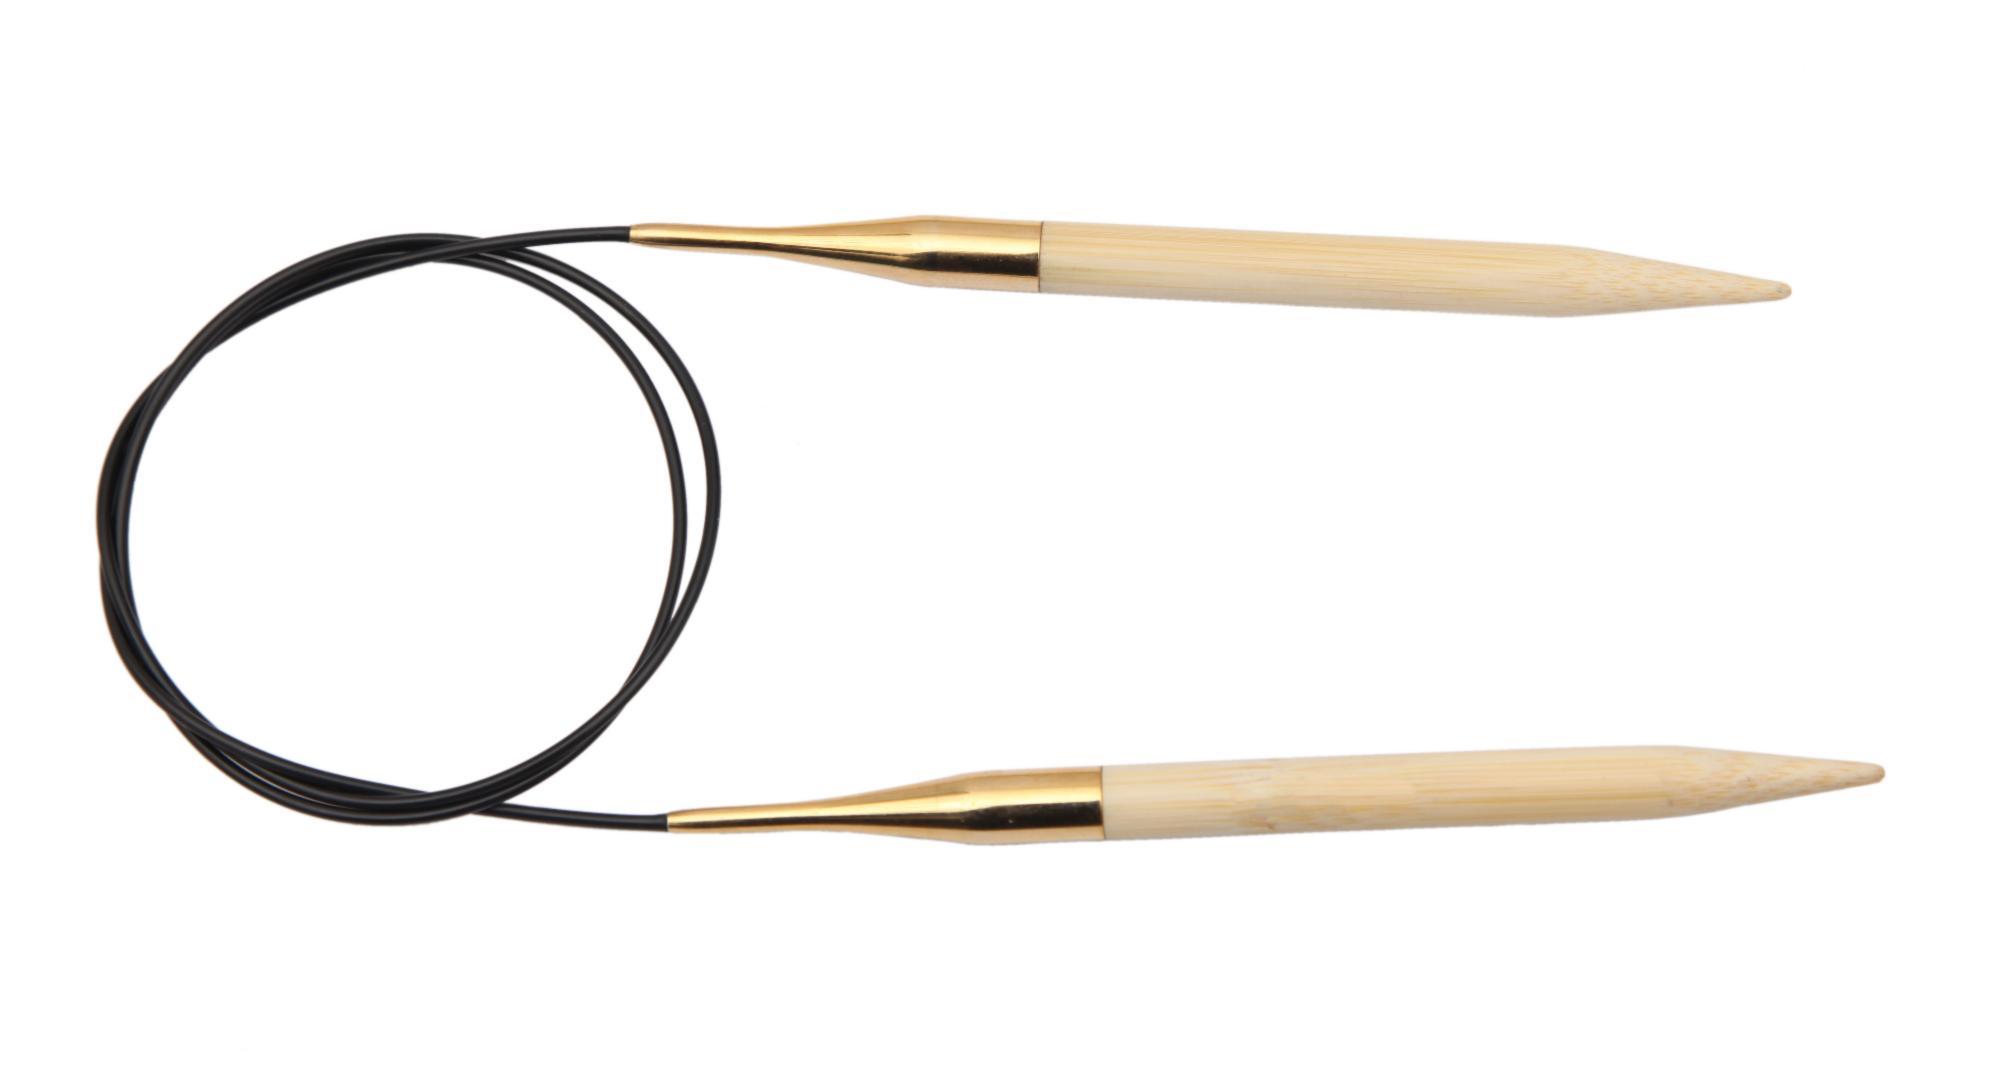 Спицы круговые 40 см Bamboo KnitPro, 22205, 3.00 мм